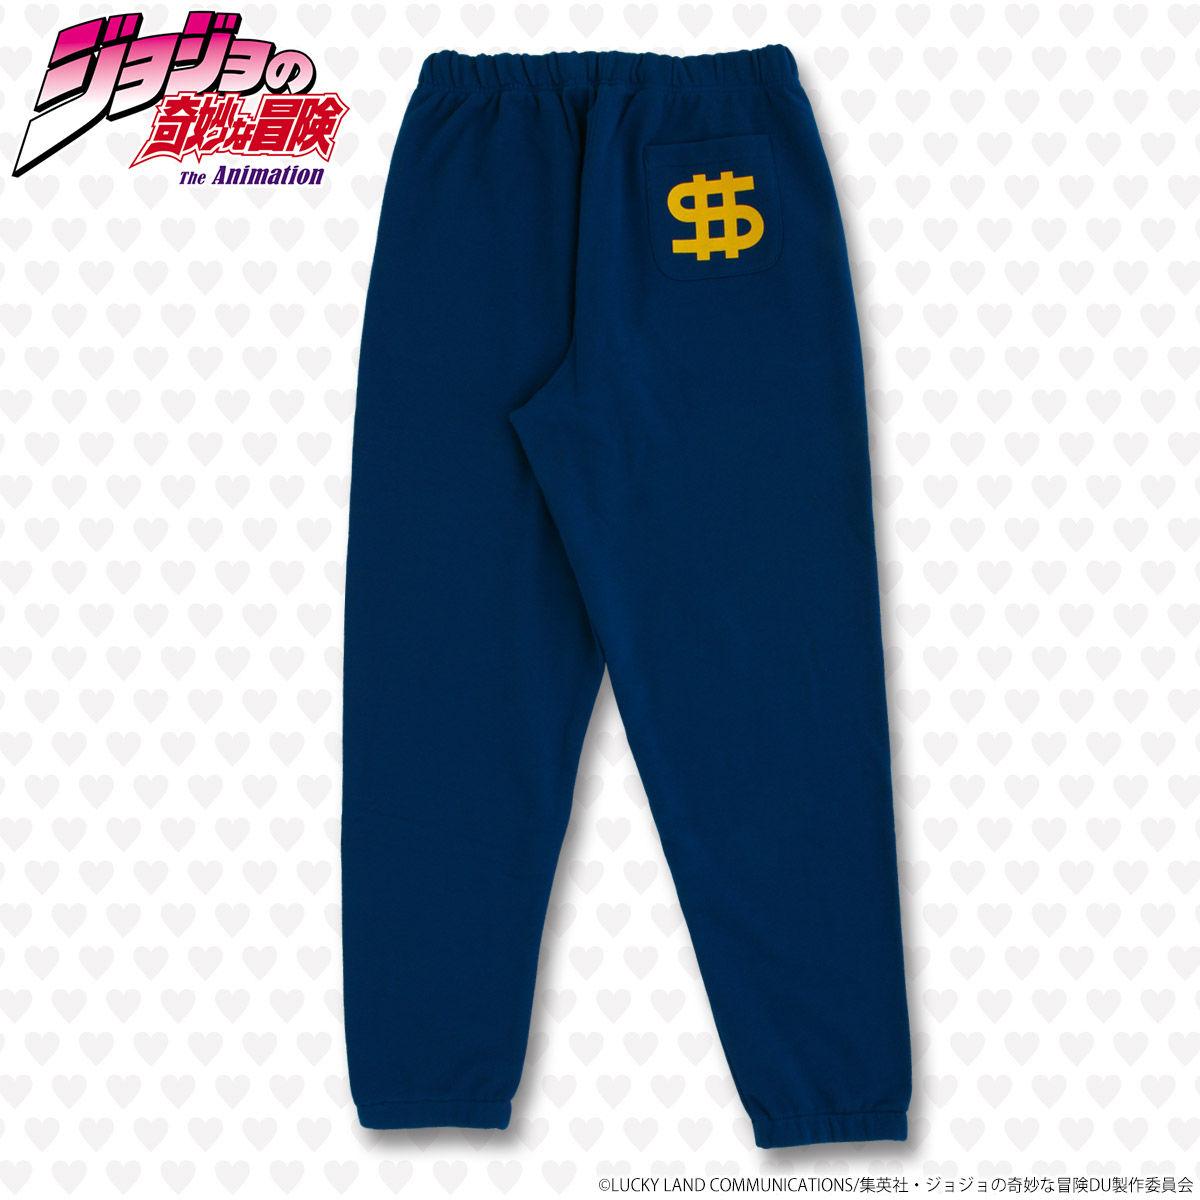 JoJo's Bizarre Adventure Okuyasu Nijimura-themed Sweatsuit